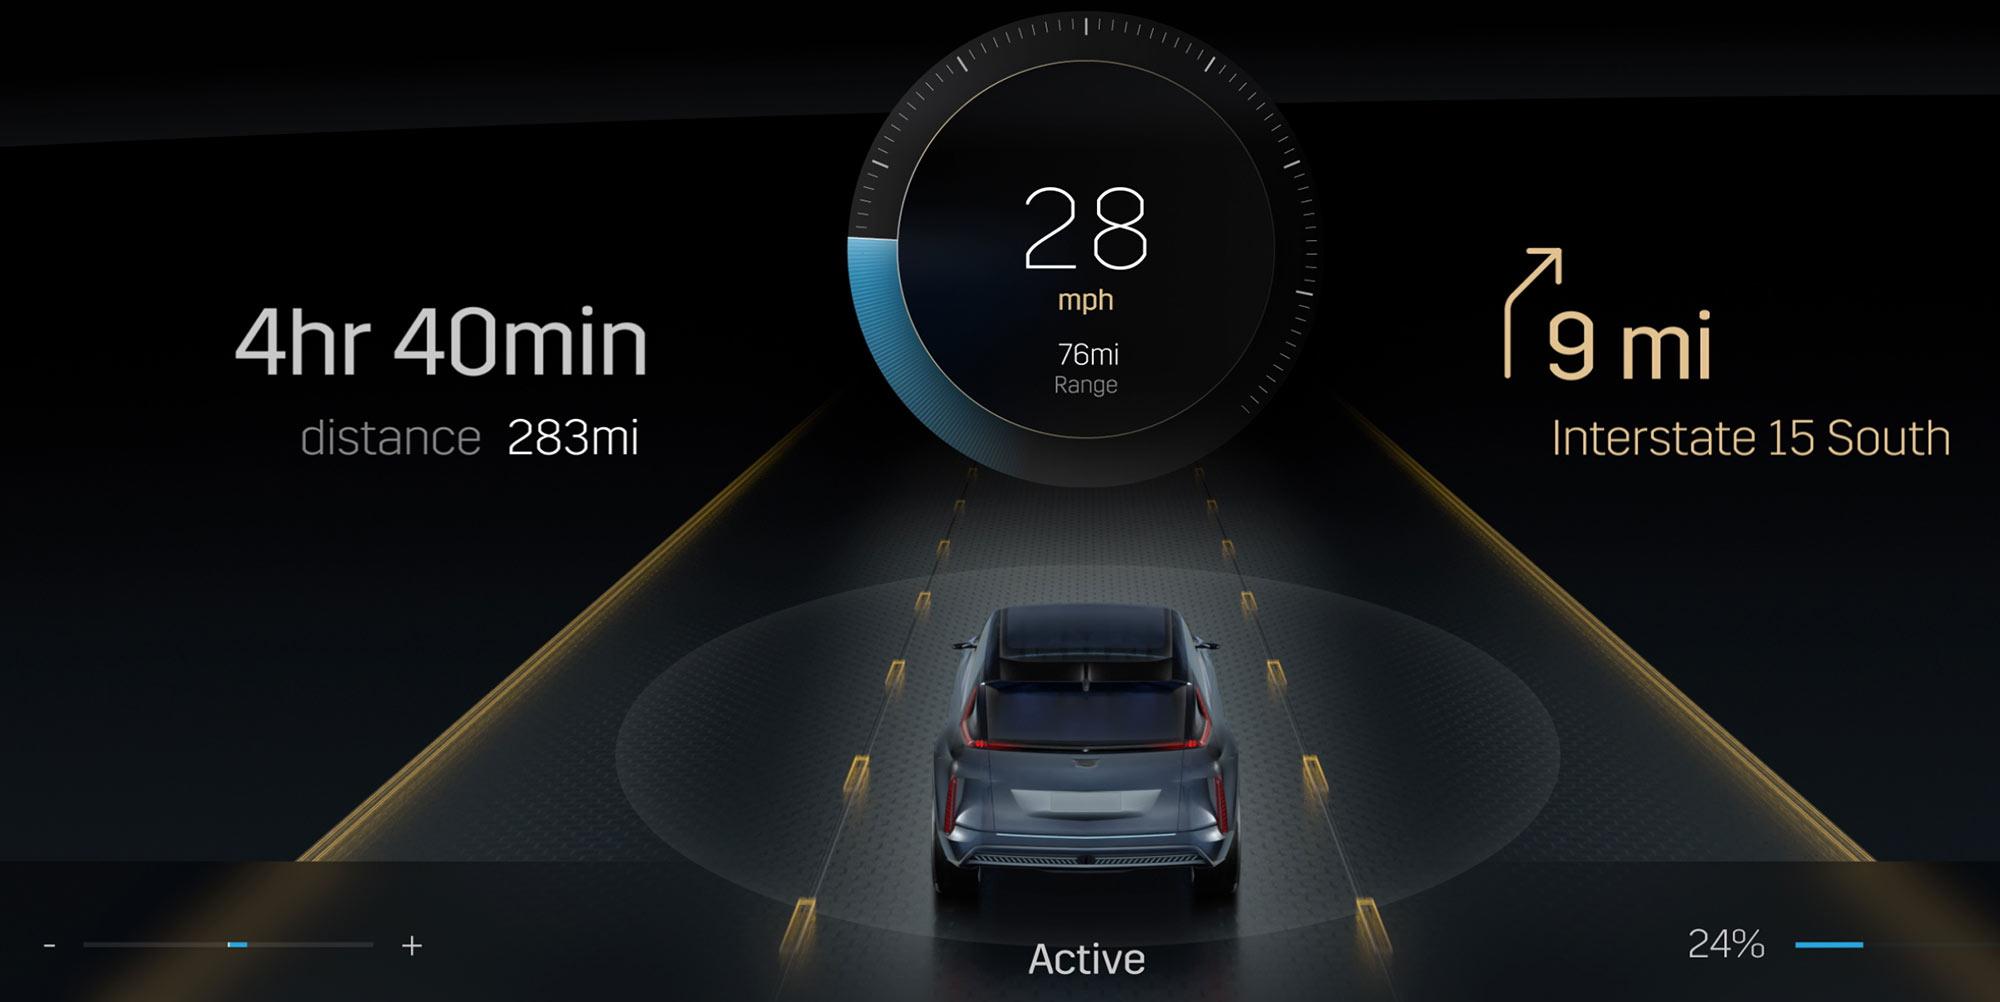 Advanced-LED-Display_Cadillac-LYRIQ-2000.jpg?w=2000&quality=82&strip=all&ssl=1